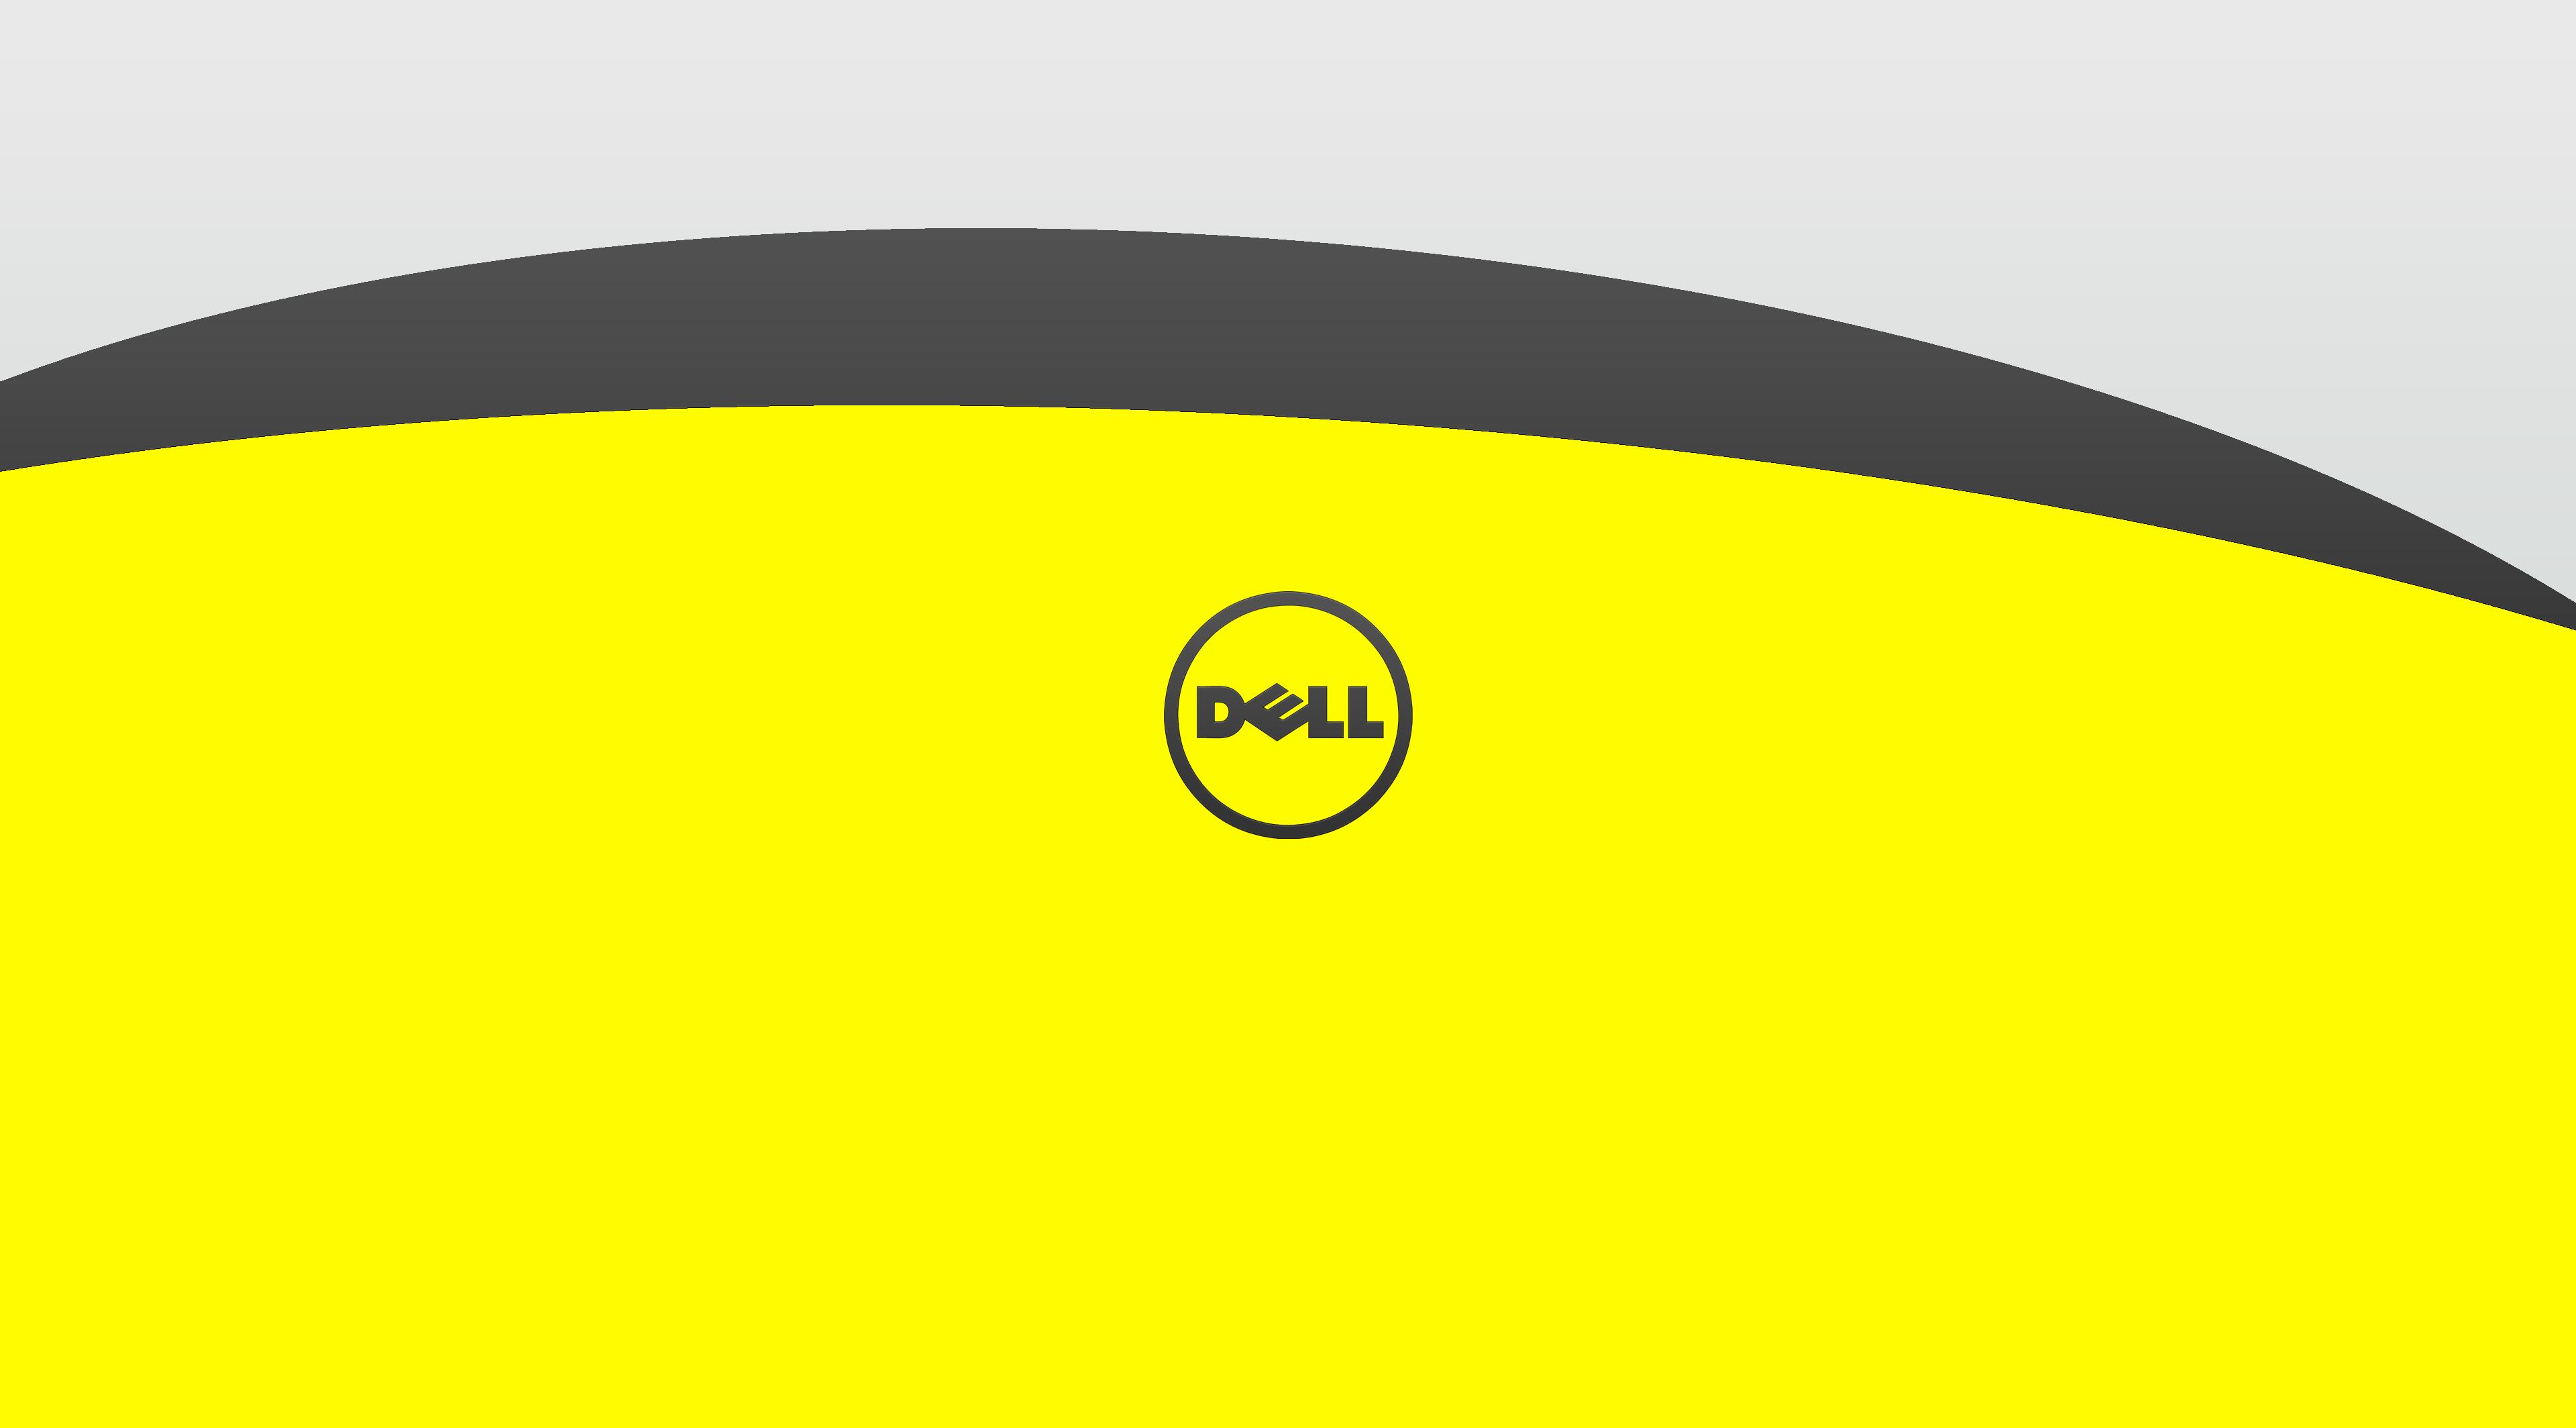 dell wallpaper 1366x768,yellow,green,circle,font,smile